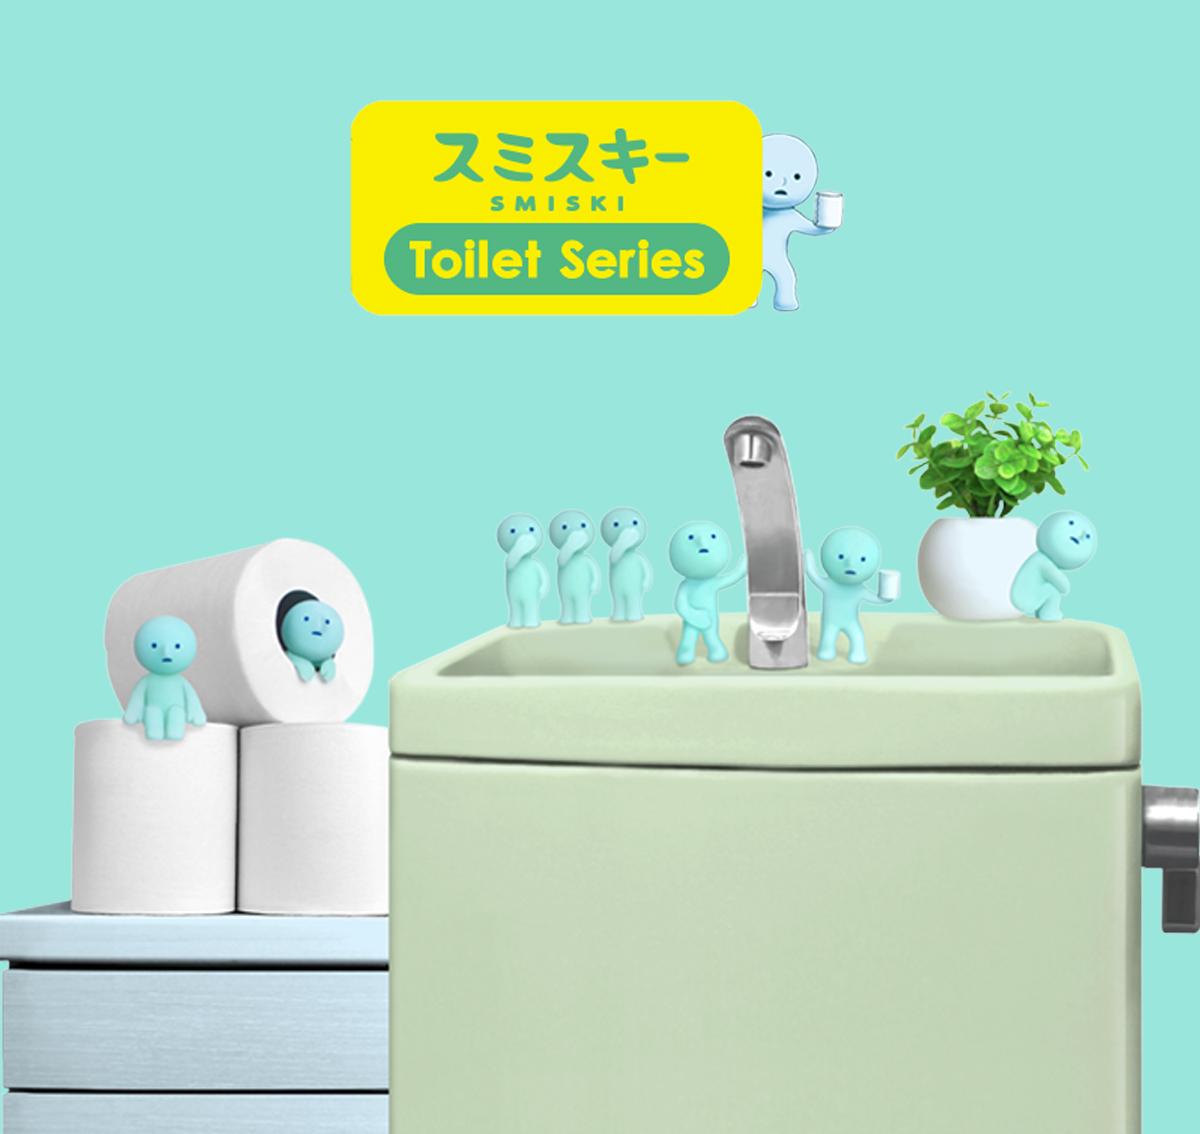 figurine japonaise-smiski-bath serie toilet toilette